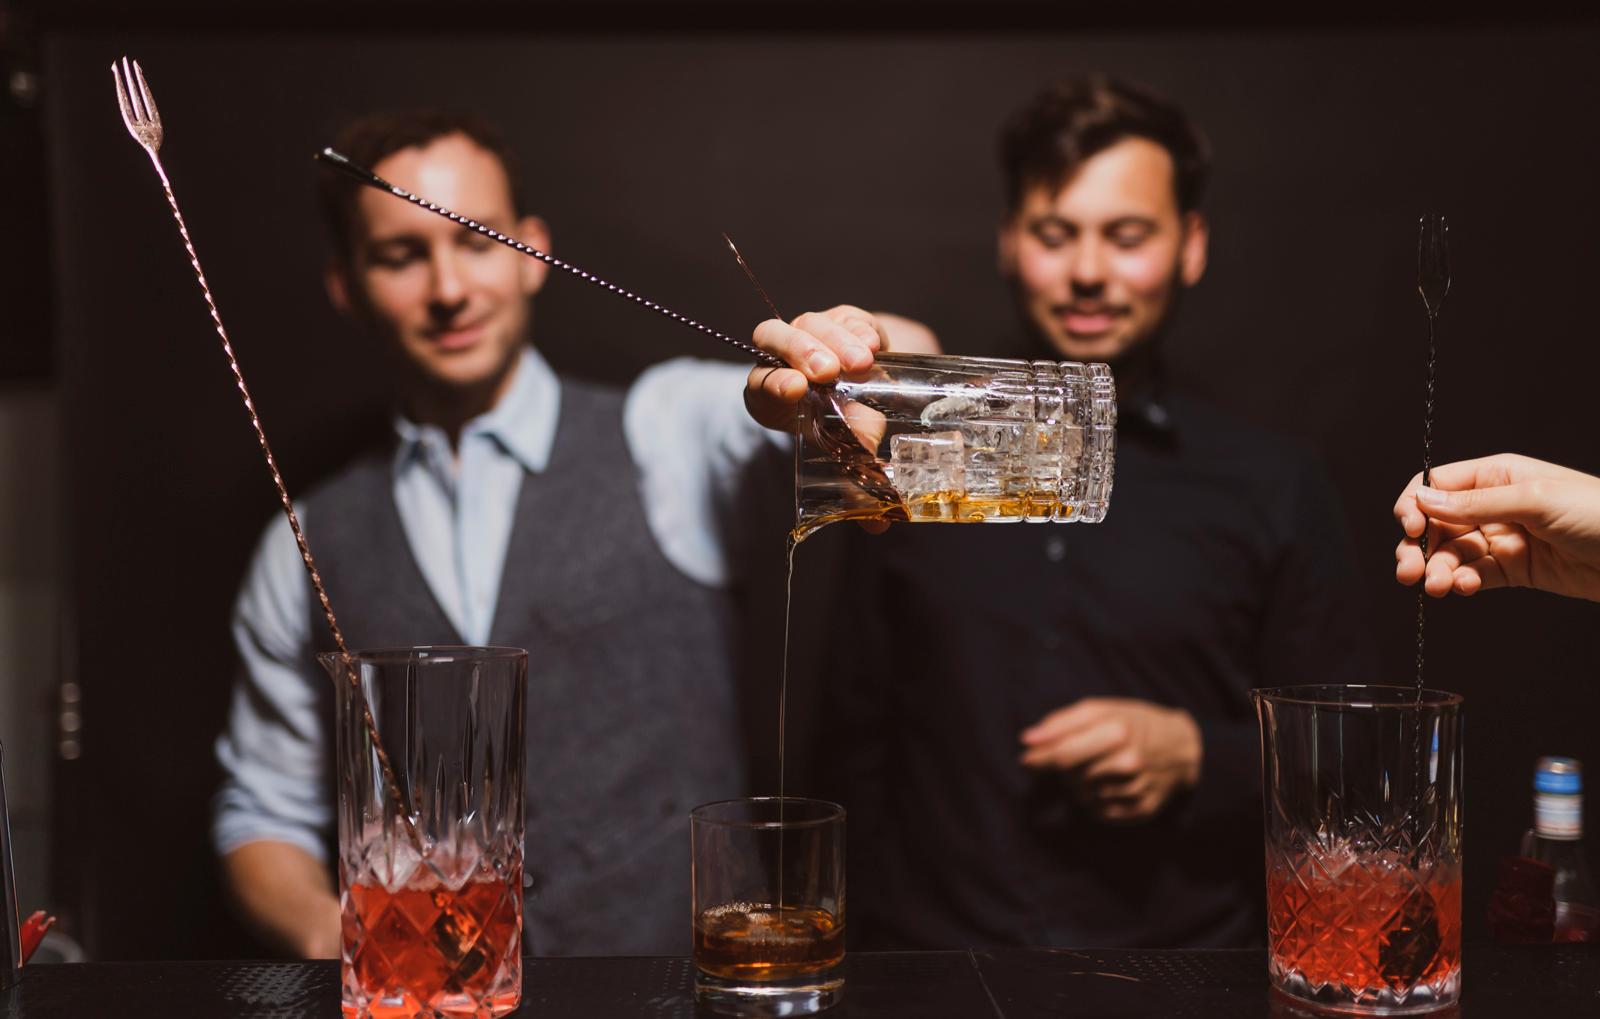 gin-tasting-freiburg-im-breisgau-bg2